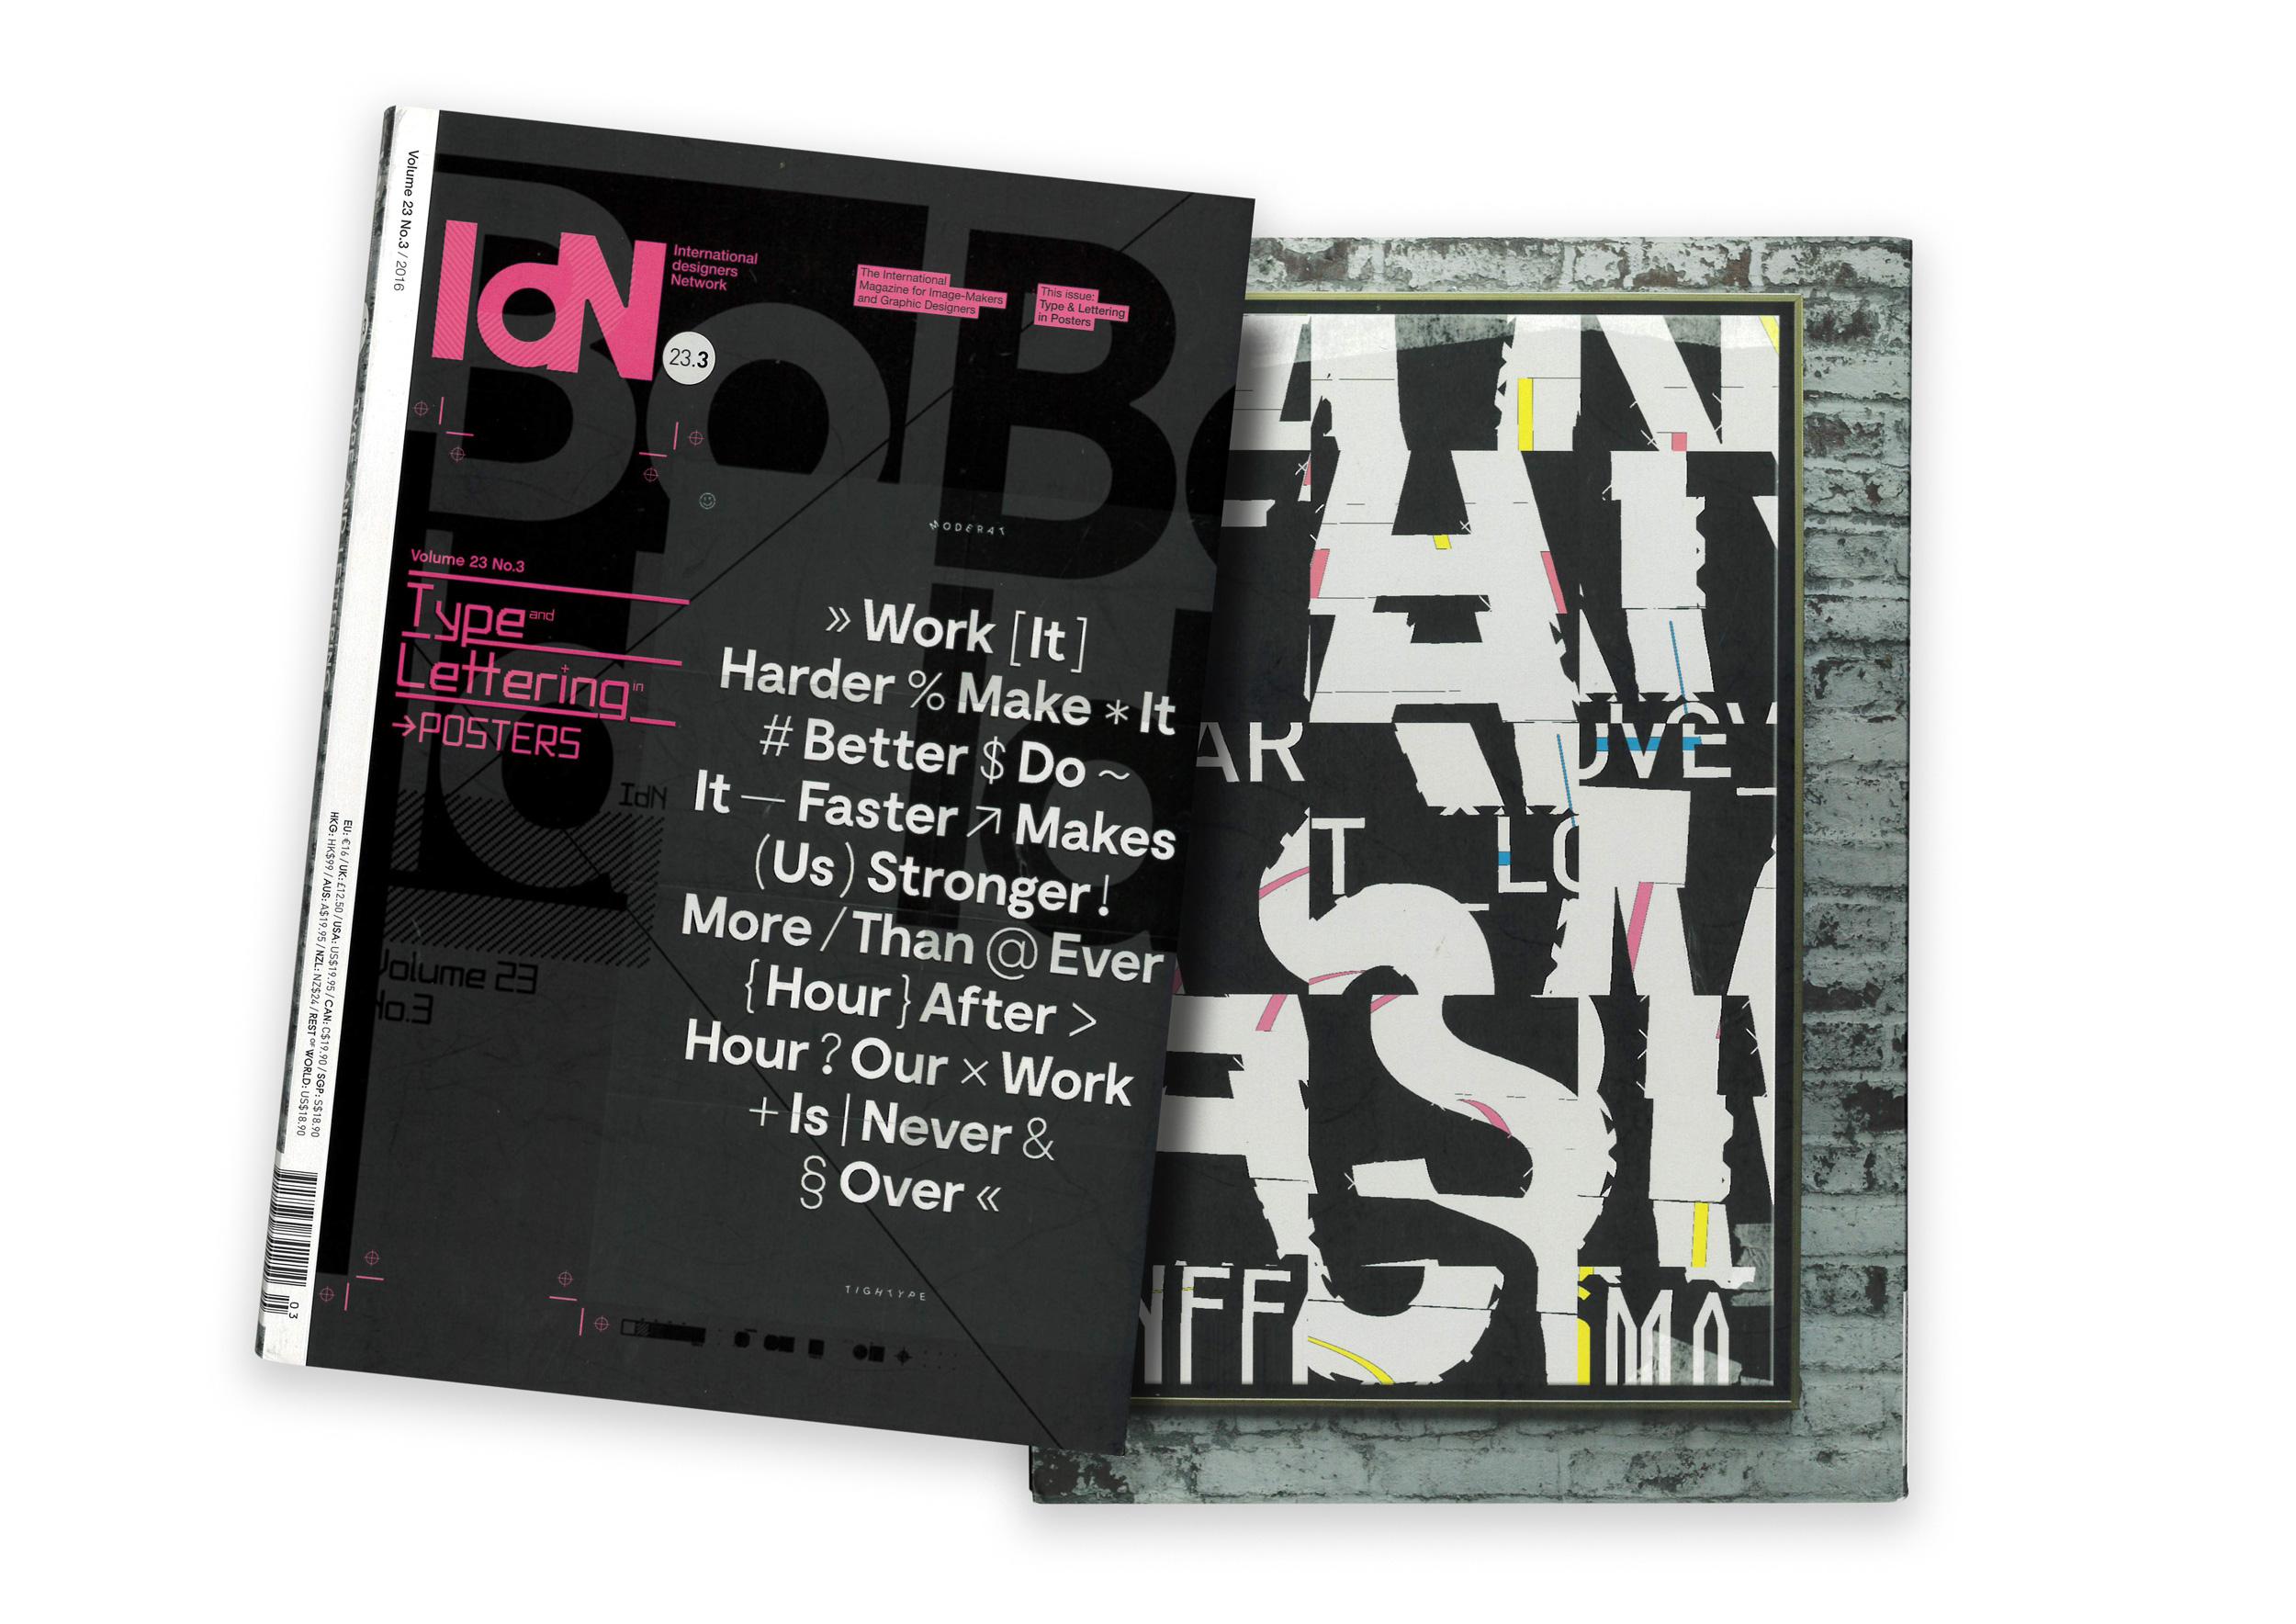 IdN_Magazine_Covers.jpg